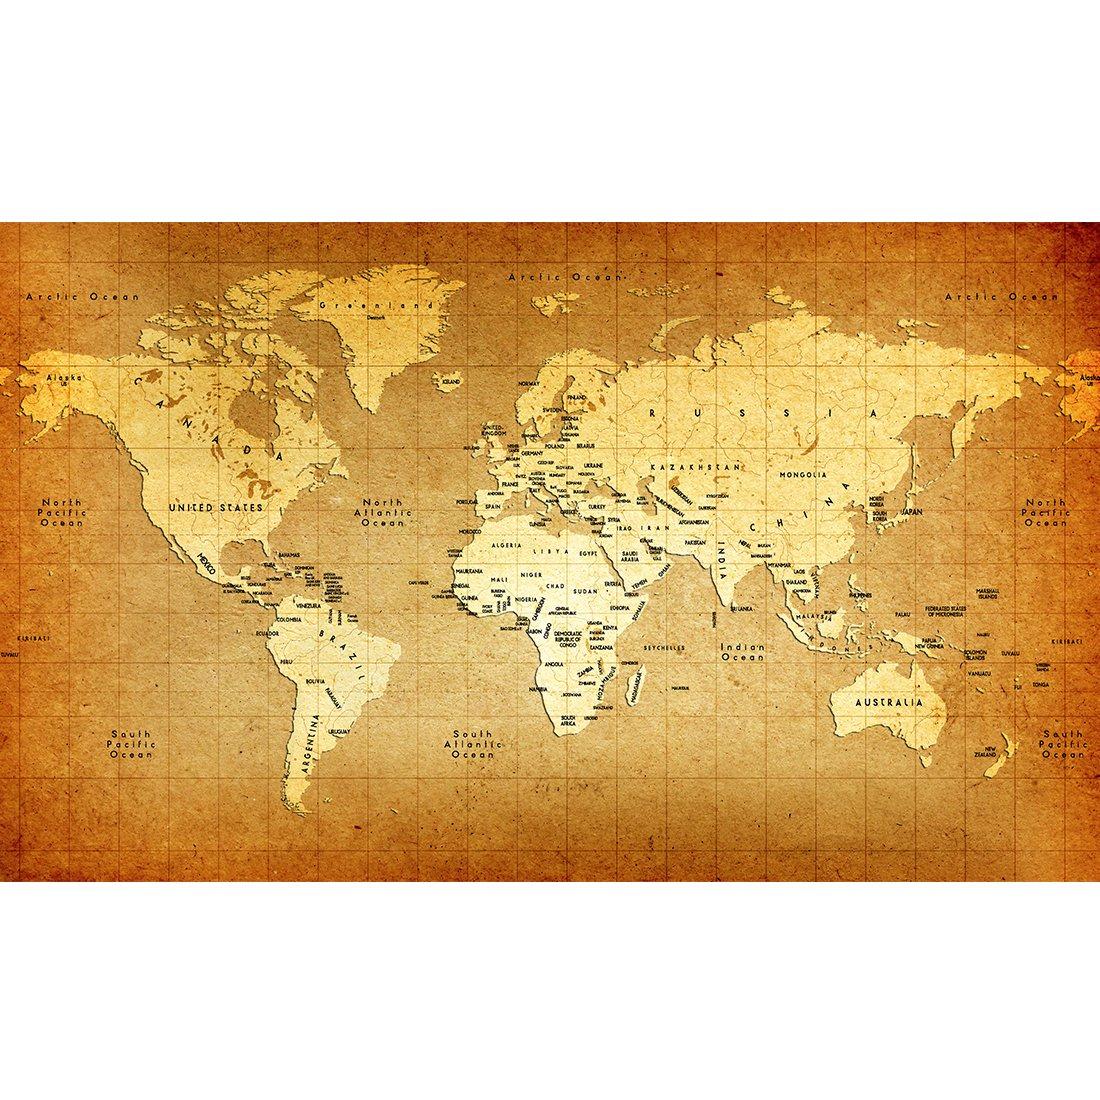 Amazon.com: Meishe Art Vintage Old World Map Poster Print ...